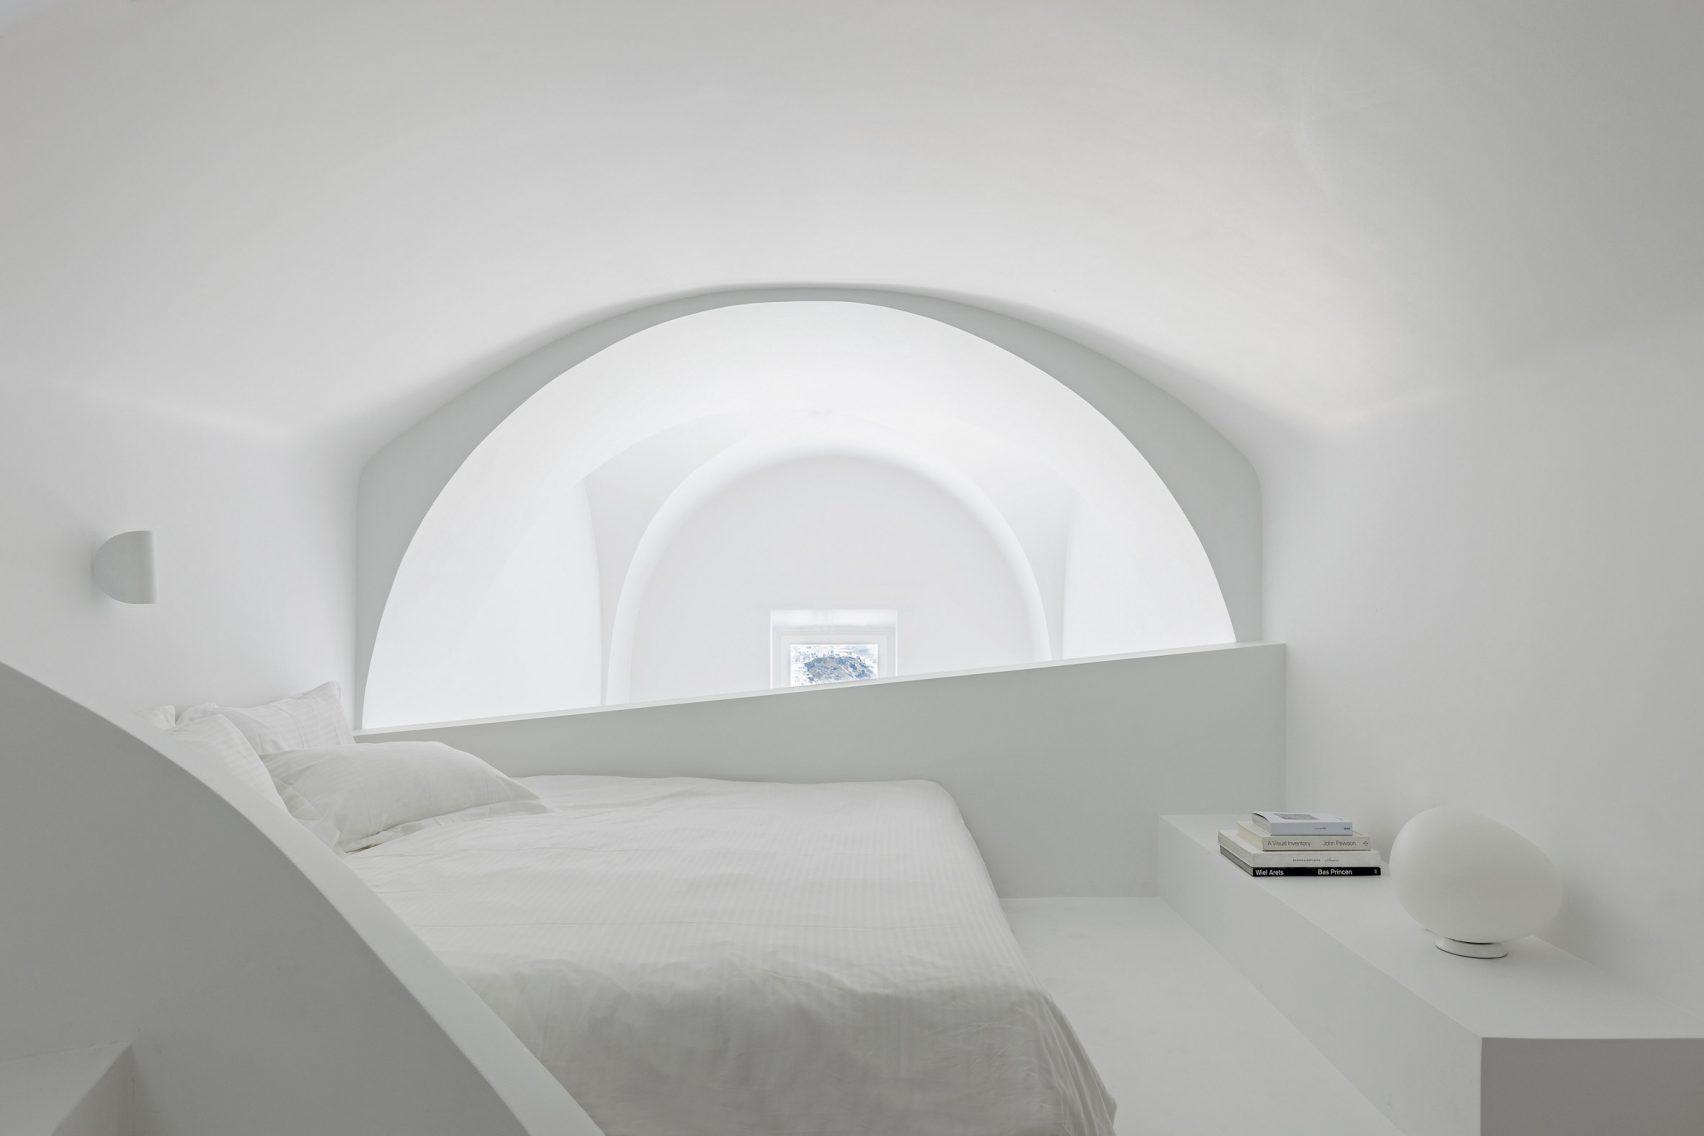 summer-residence-santorini-kapsimalis-architects-greece-architecture_dezeen_2364_col_1-1704x1136